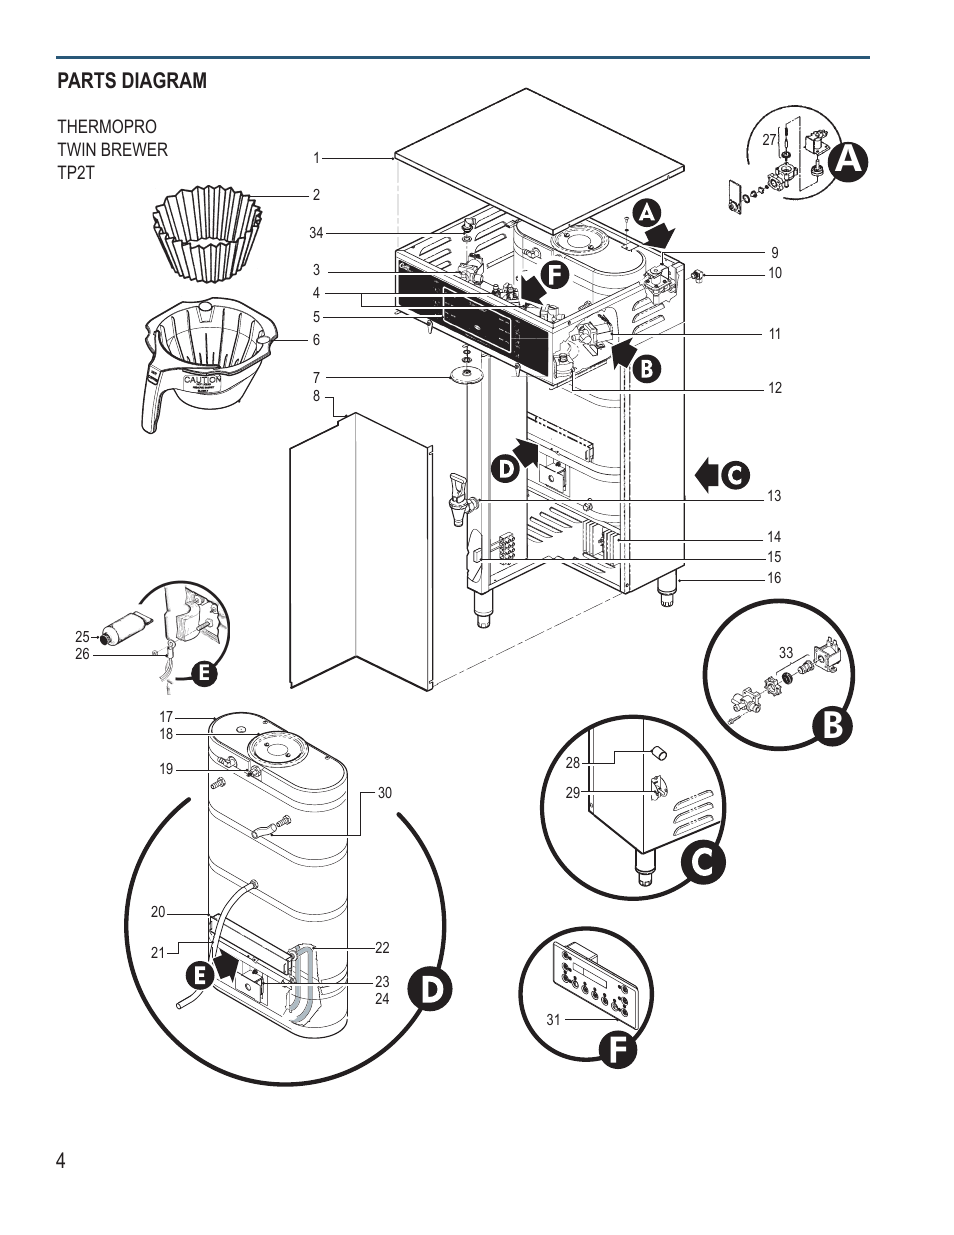 4parts diagram | Wilbur Curtis TP2S